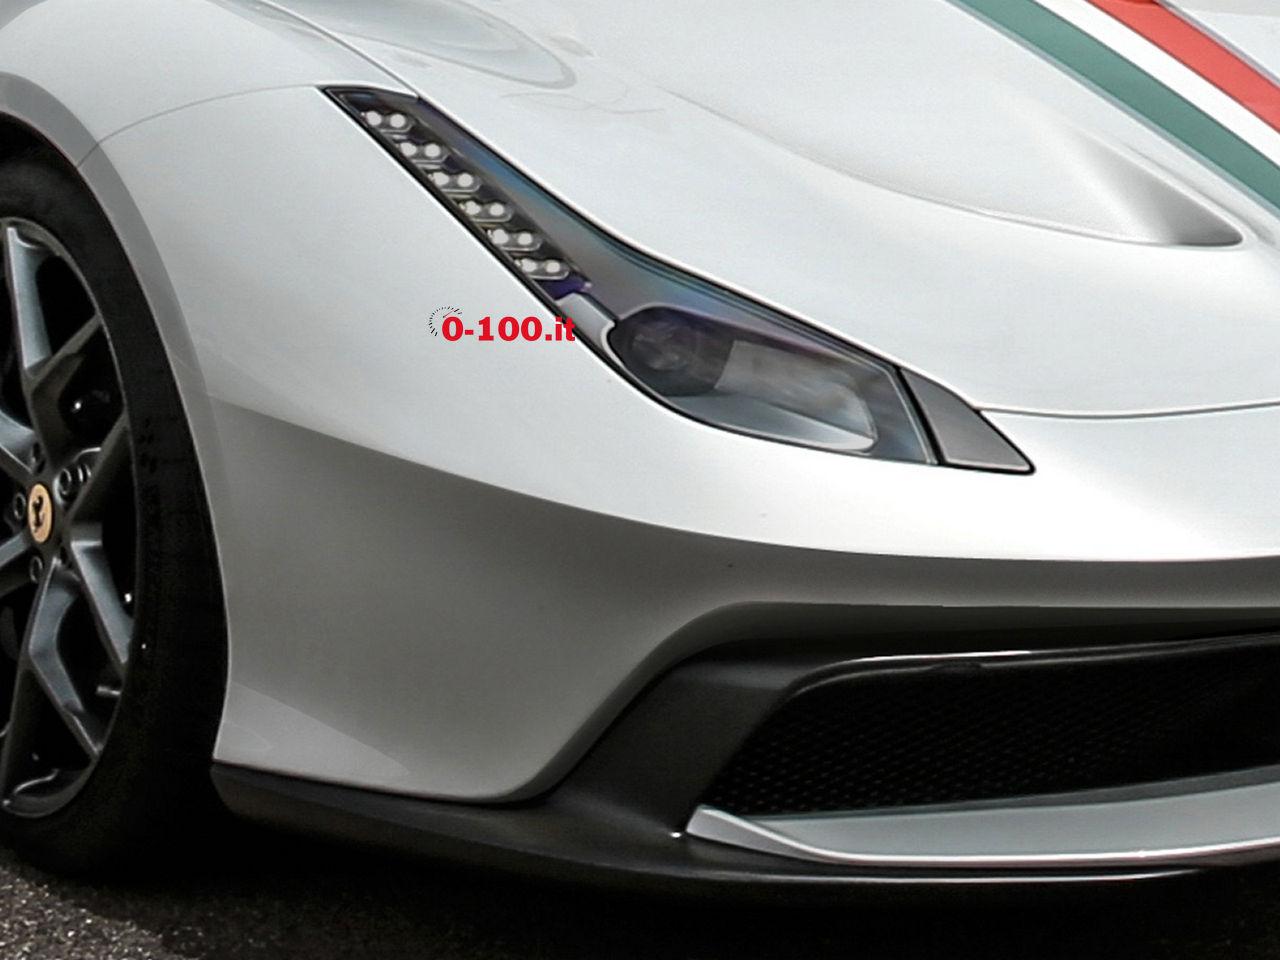 ferrari-458-mm-speciale-one-off_0-100_4